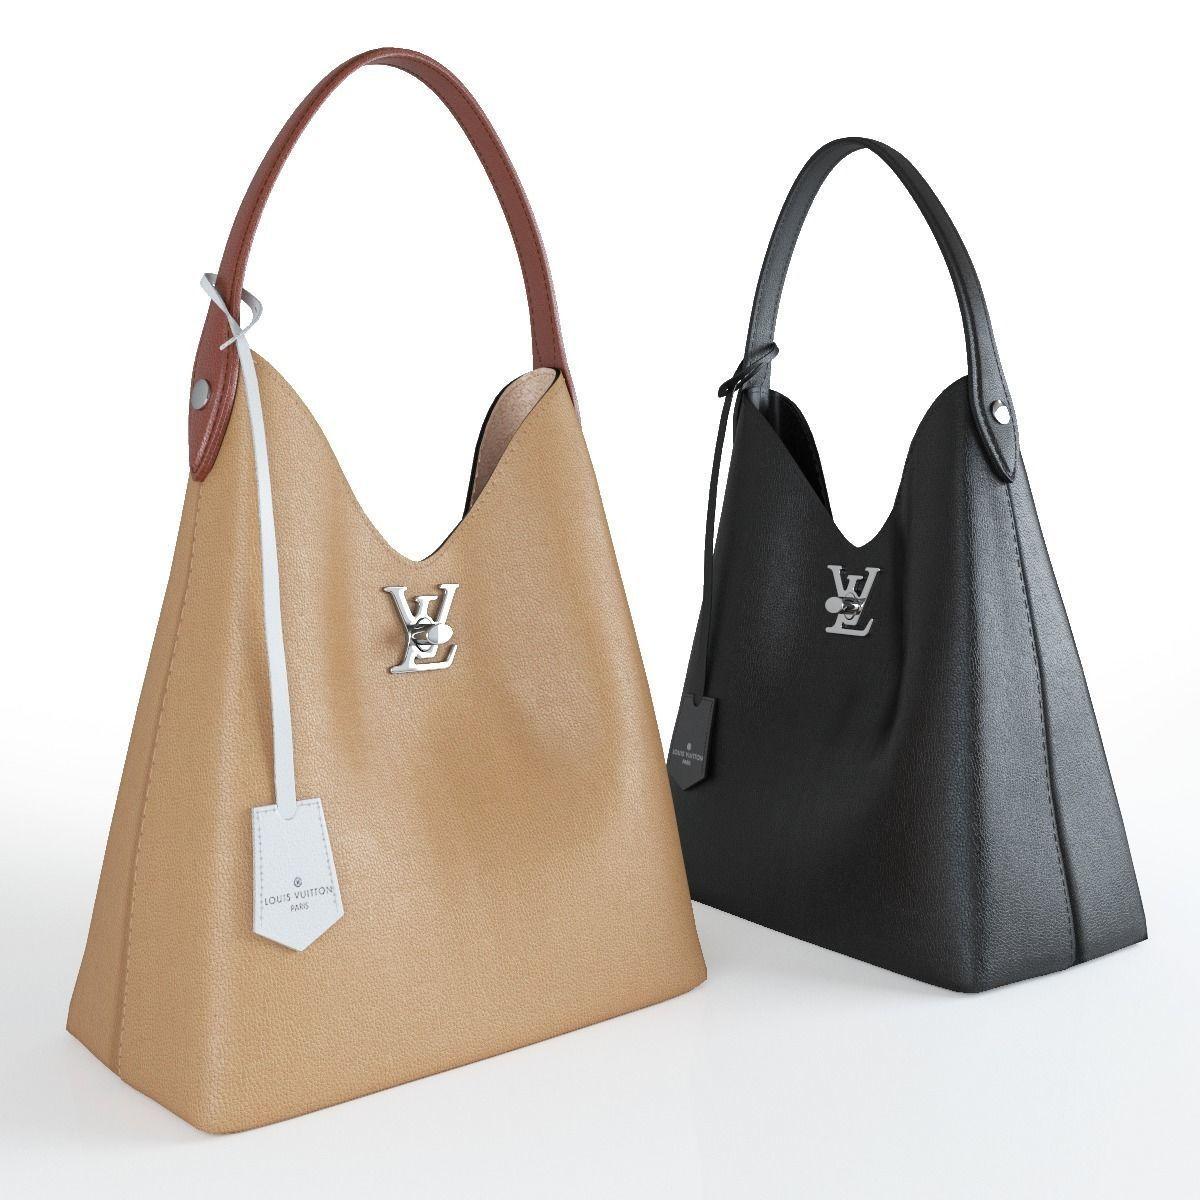 Louis Vuitton Women leather handbag